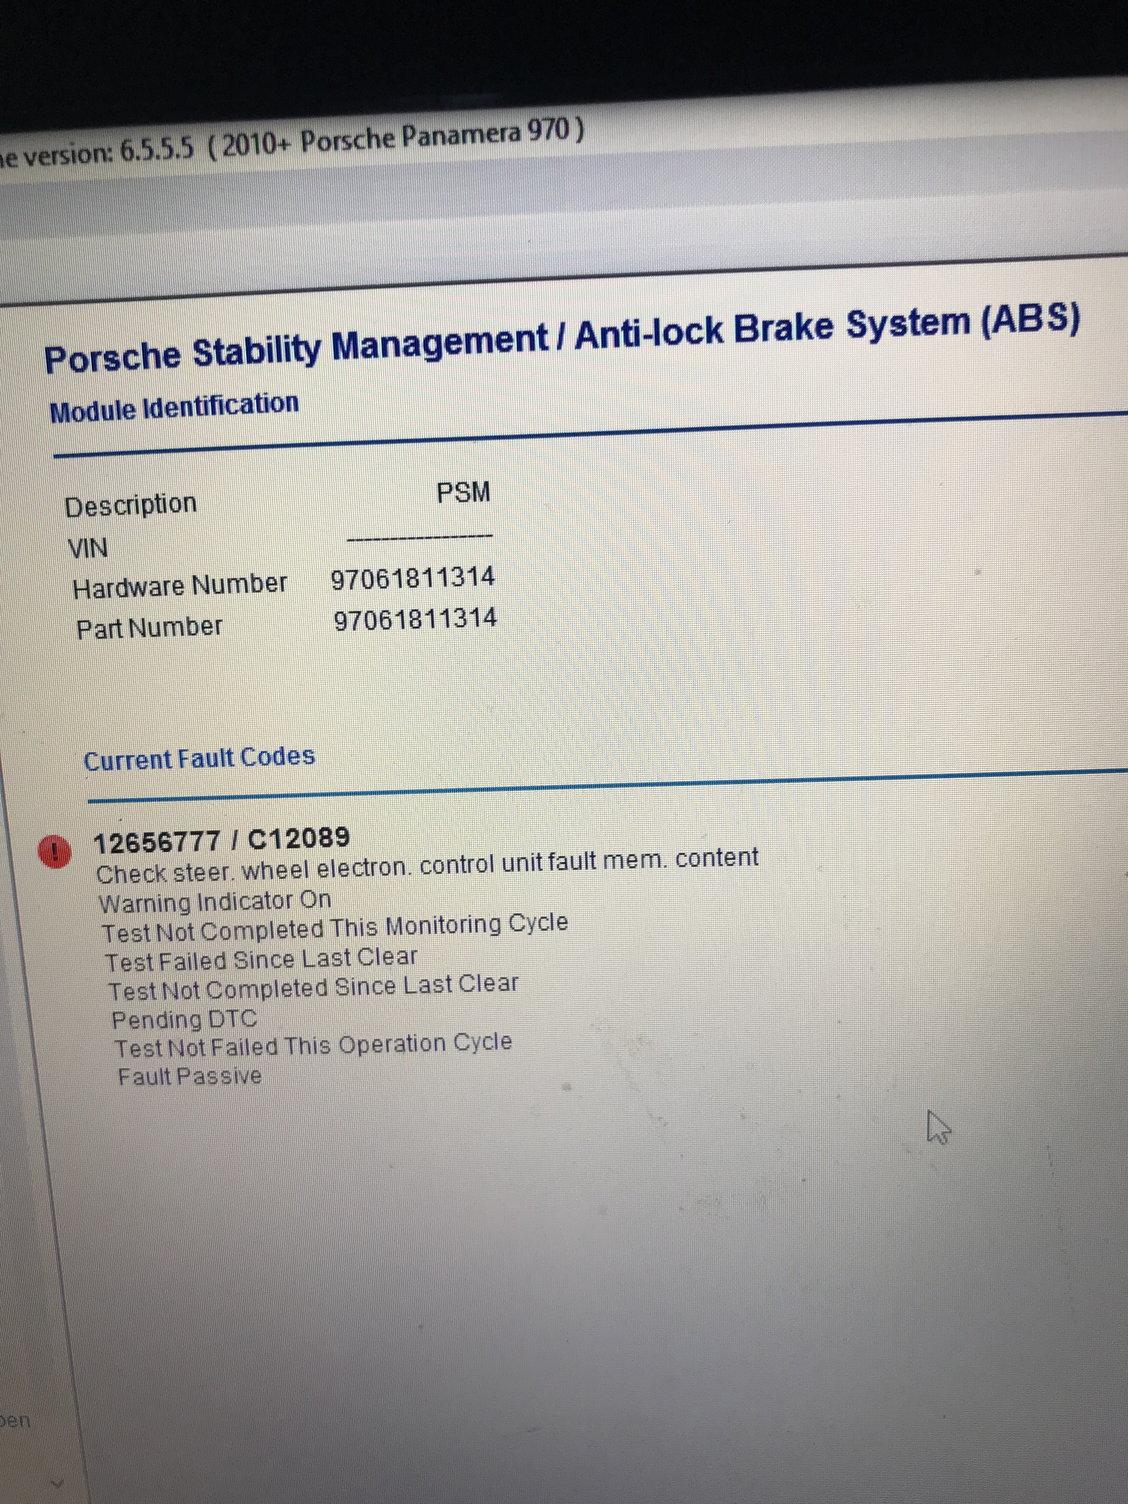 Porsche panamera Psm failure /Durametric Error shown